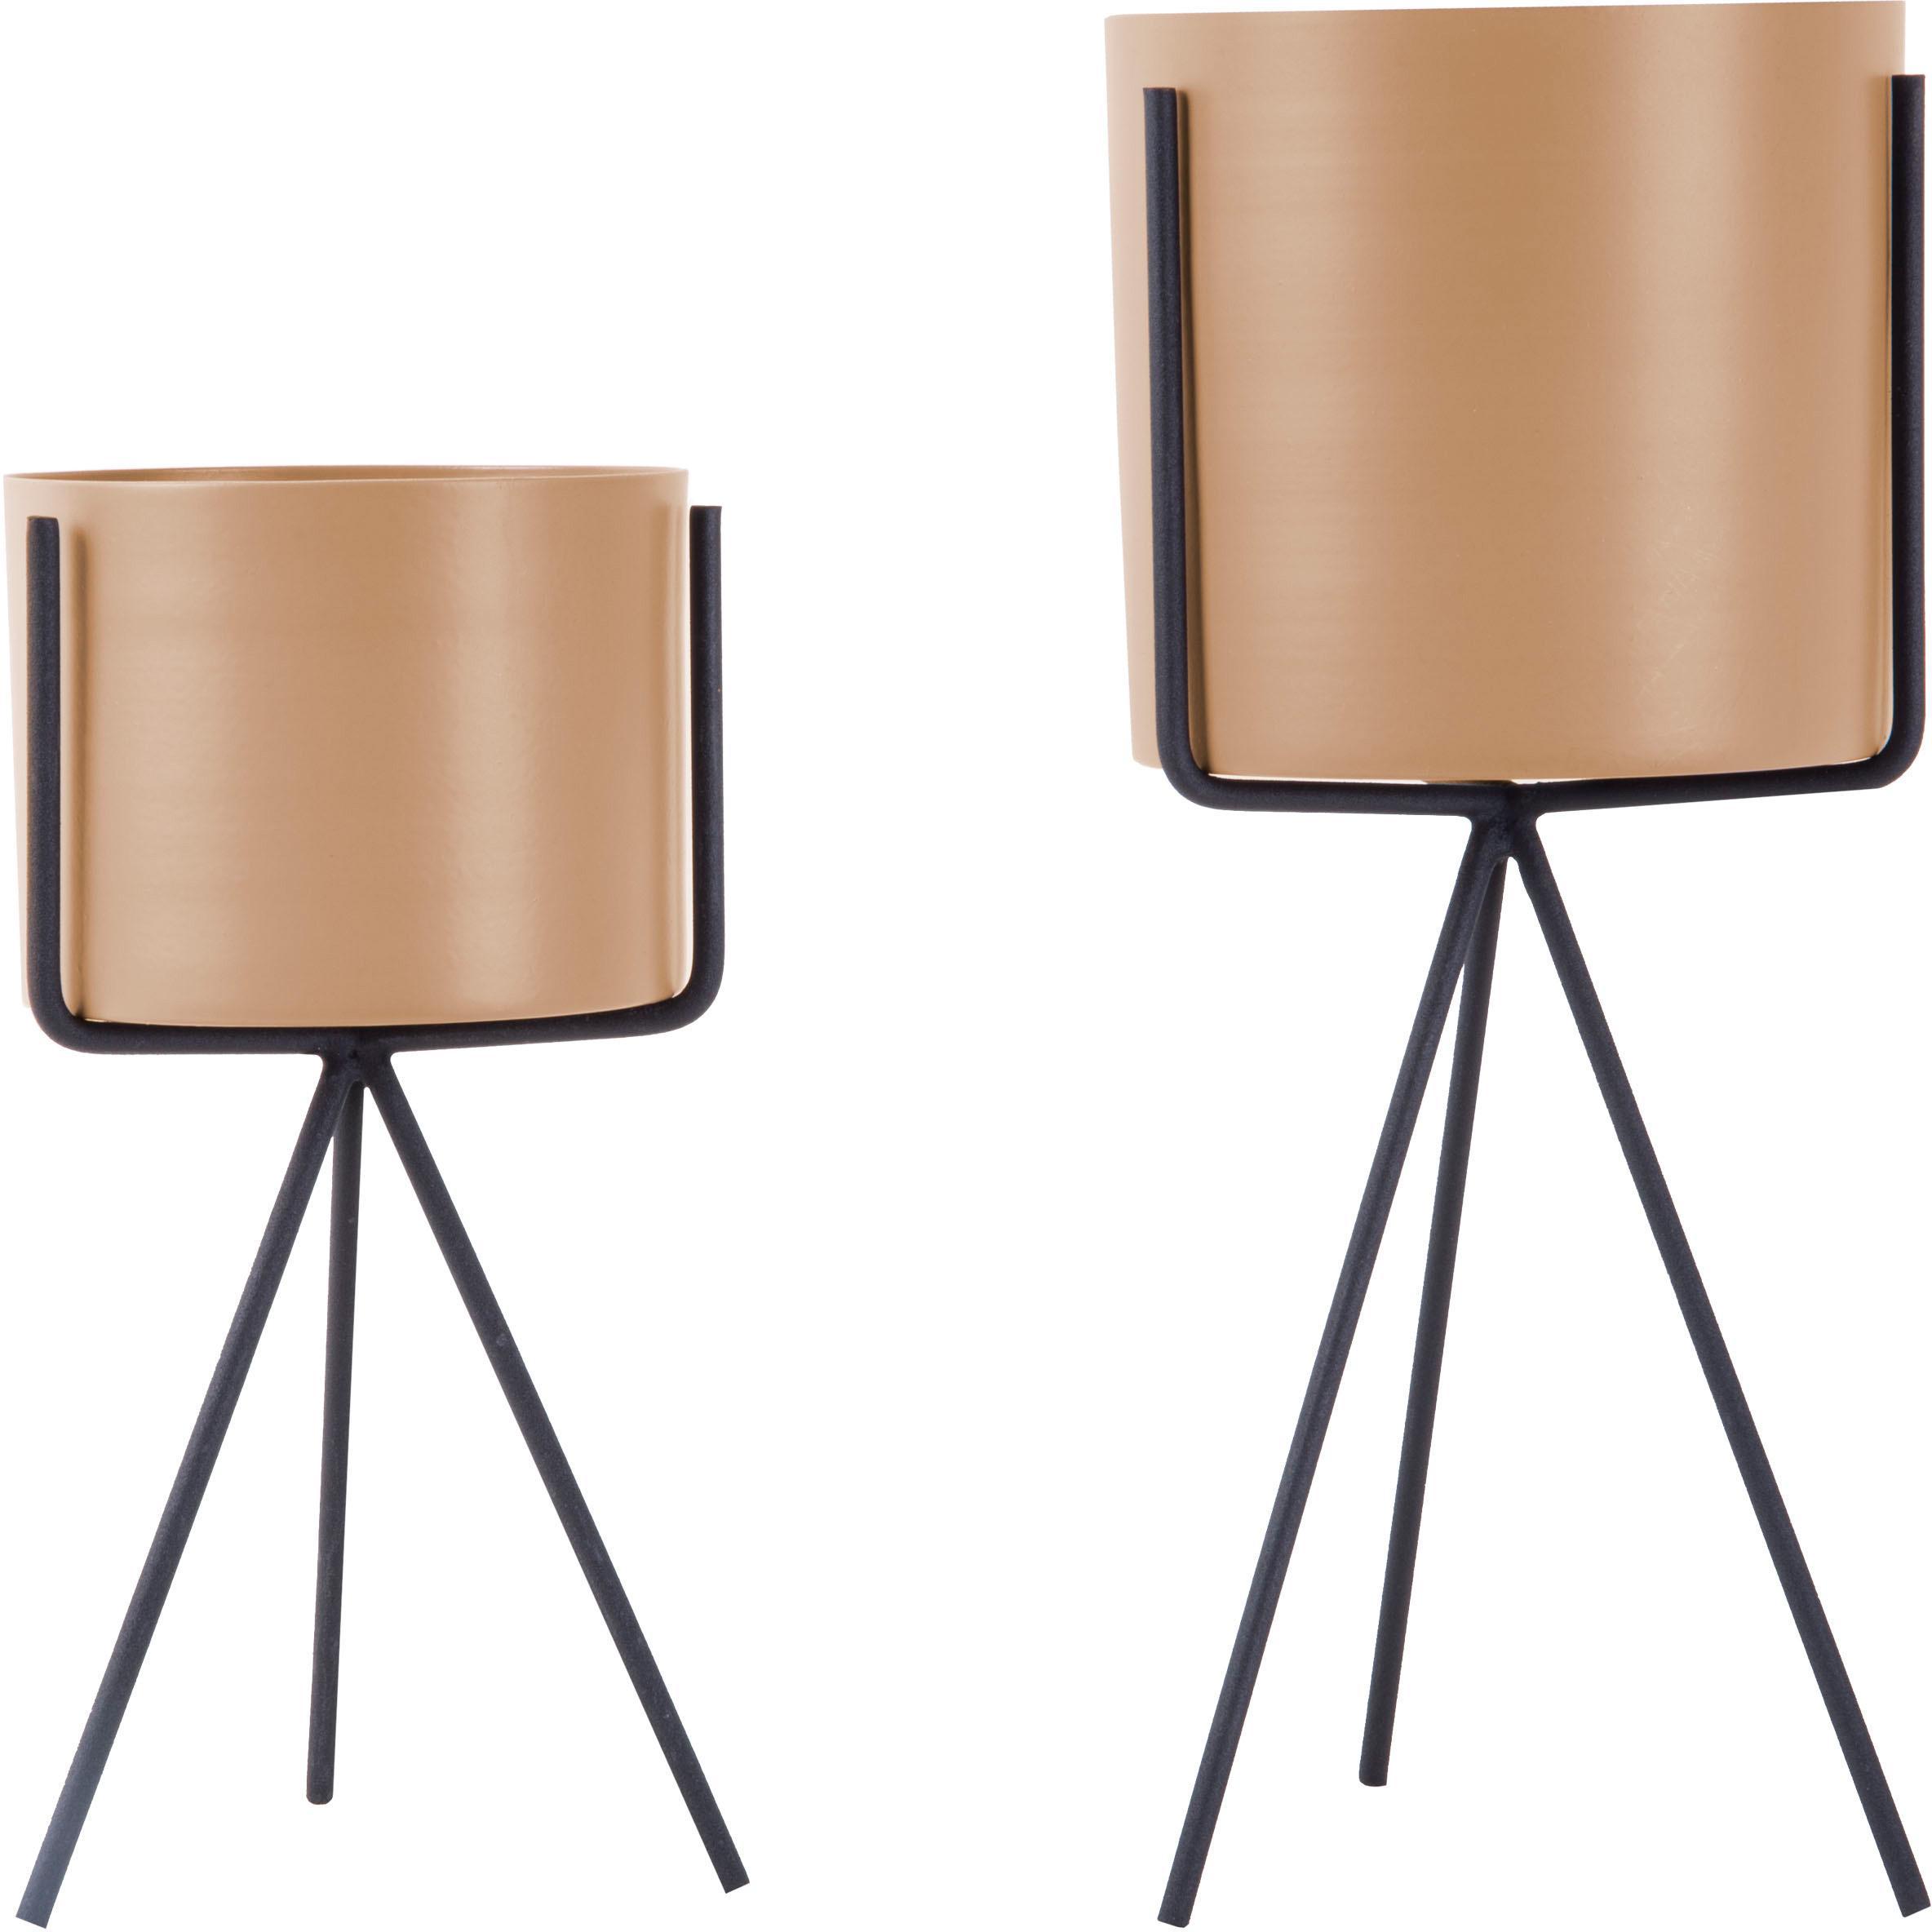 Set de macetas Pedestal, 2pzas., Metal recubierto, Color arena, negro, Ø 13 x Al 30 cm